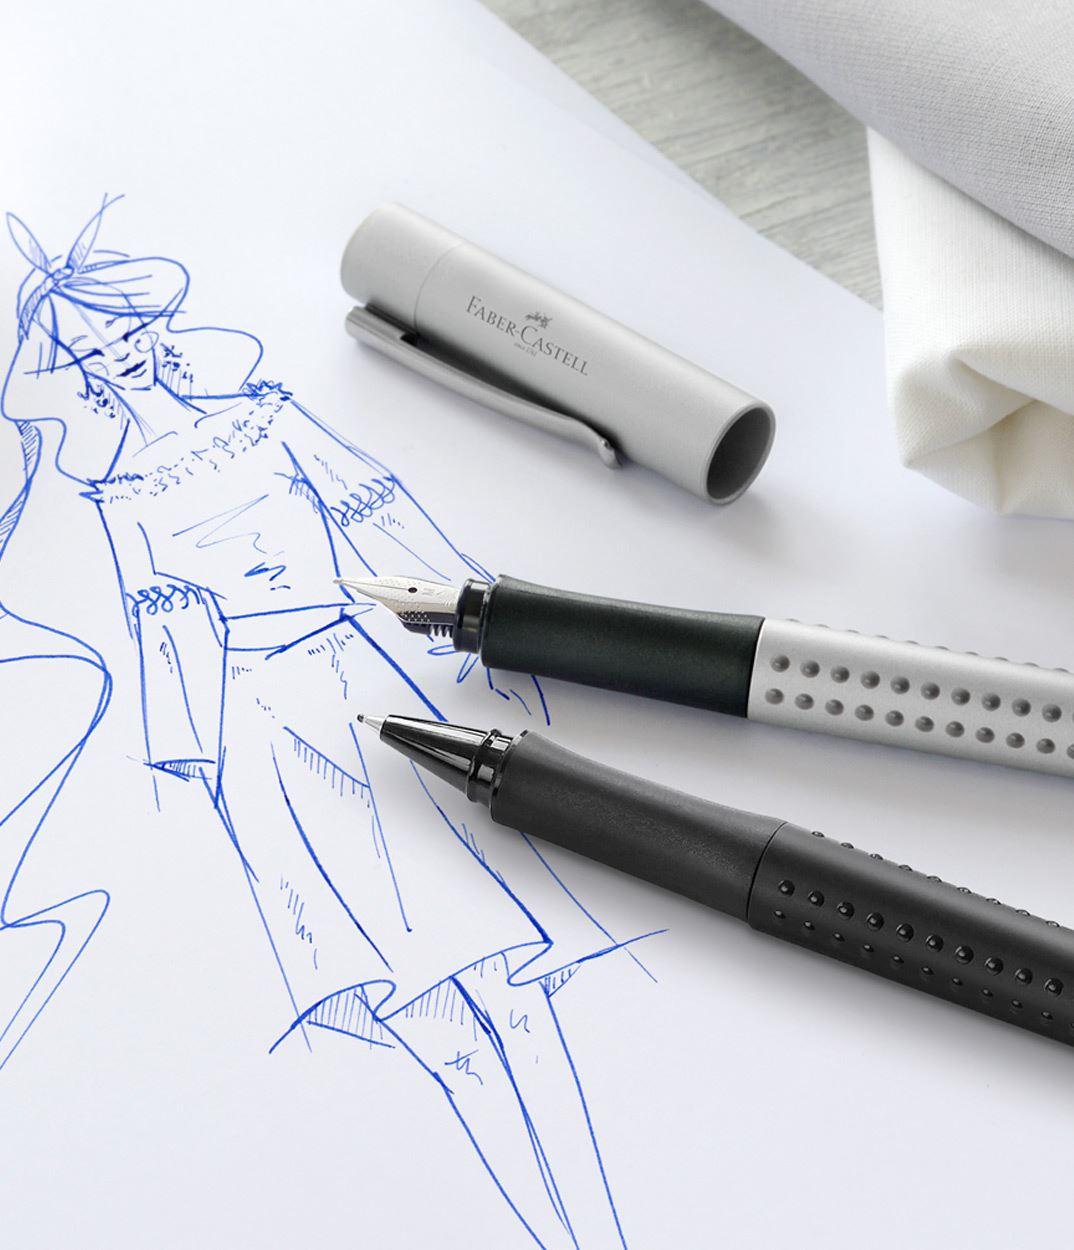 Pluma estilogr/áfica color azul Faber-Castell 201506 Gripset 2011 punta M, un bol/ígrafo, tinta y convertidor